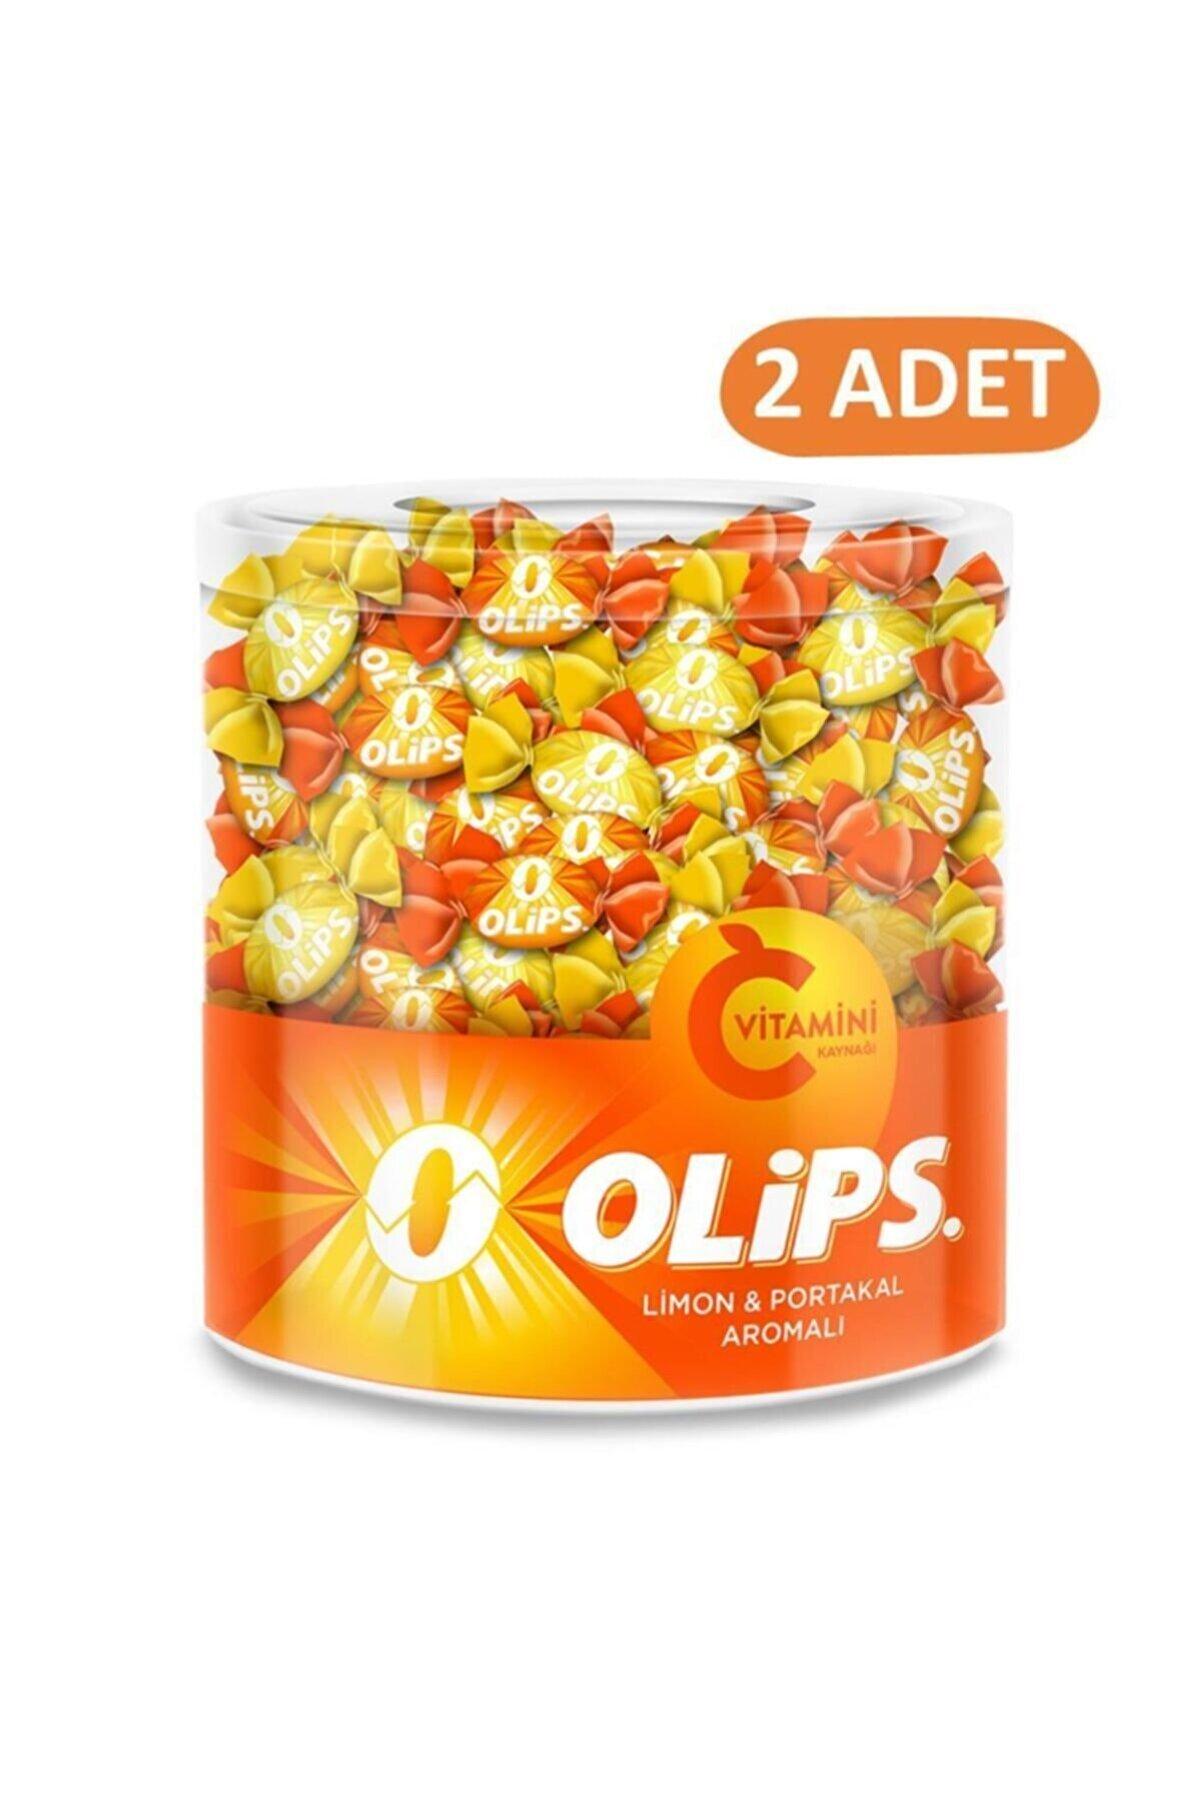 Olips C Vitaminli Limon&portakal Aromalı 462 Gr Kavanoz Şeker - 2 Adet